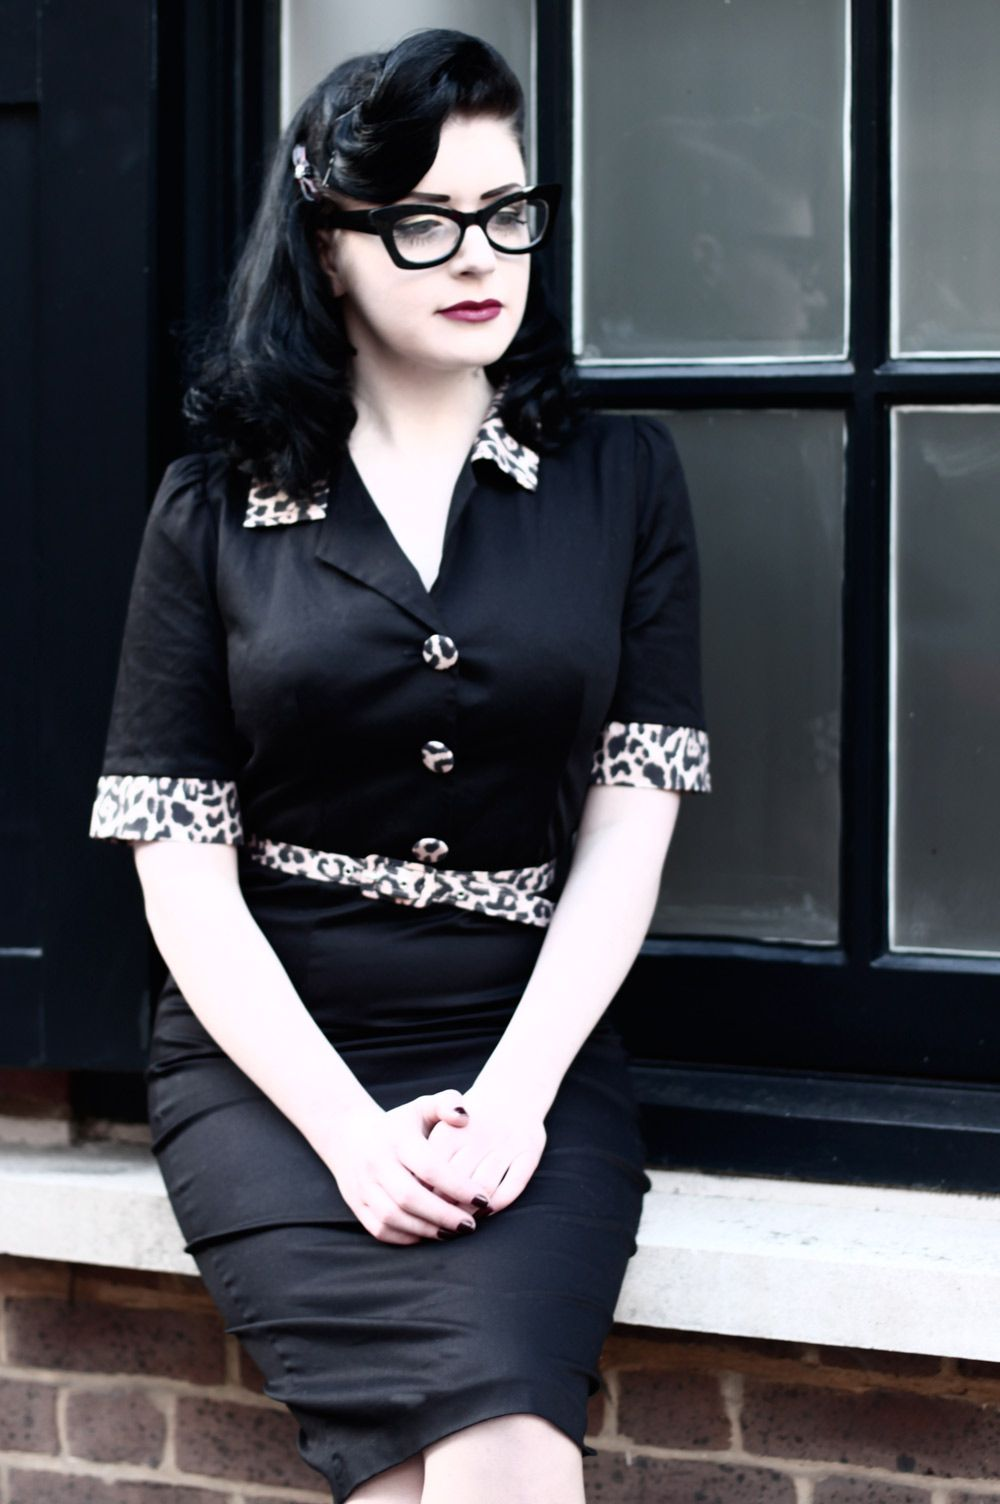 Tara Starlet 1940s 40s Style: Black Tara Starlet Dress With Leopard Print Details. Love